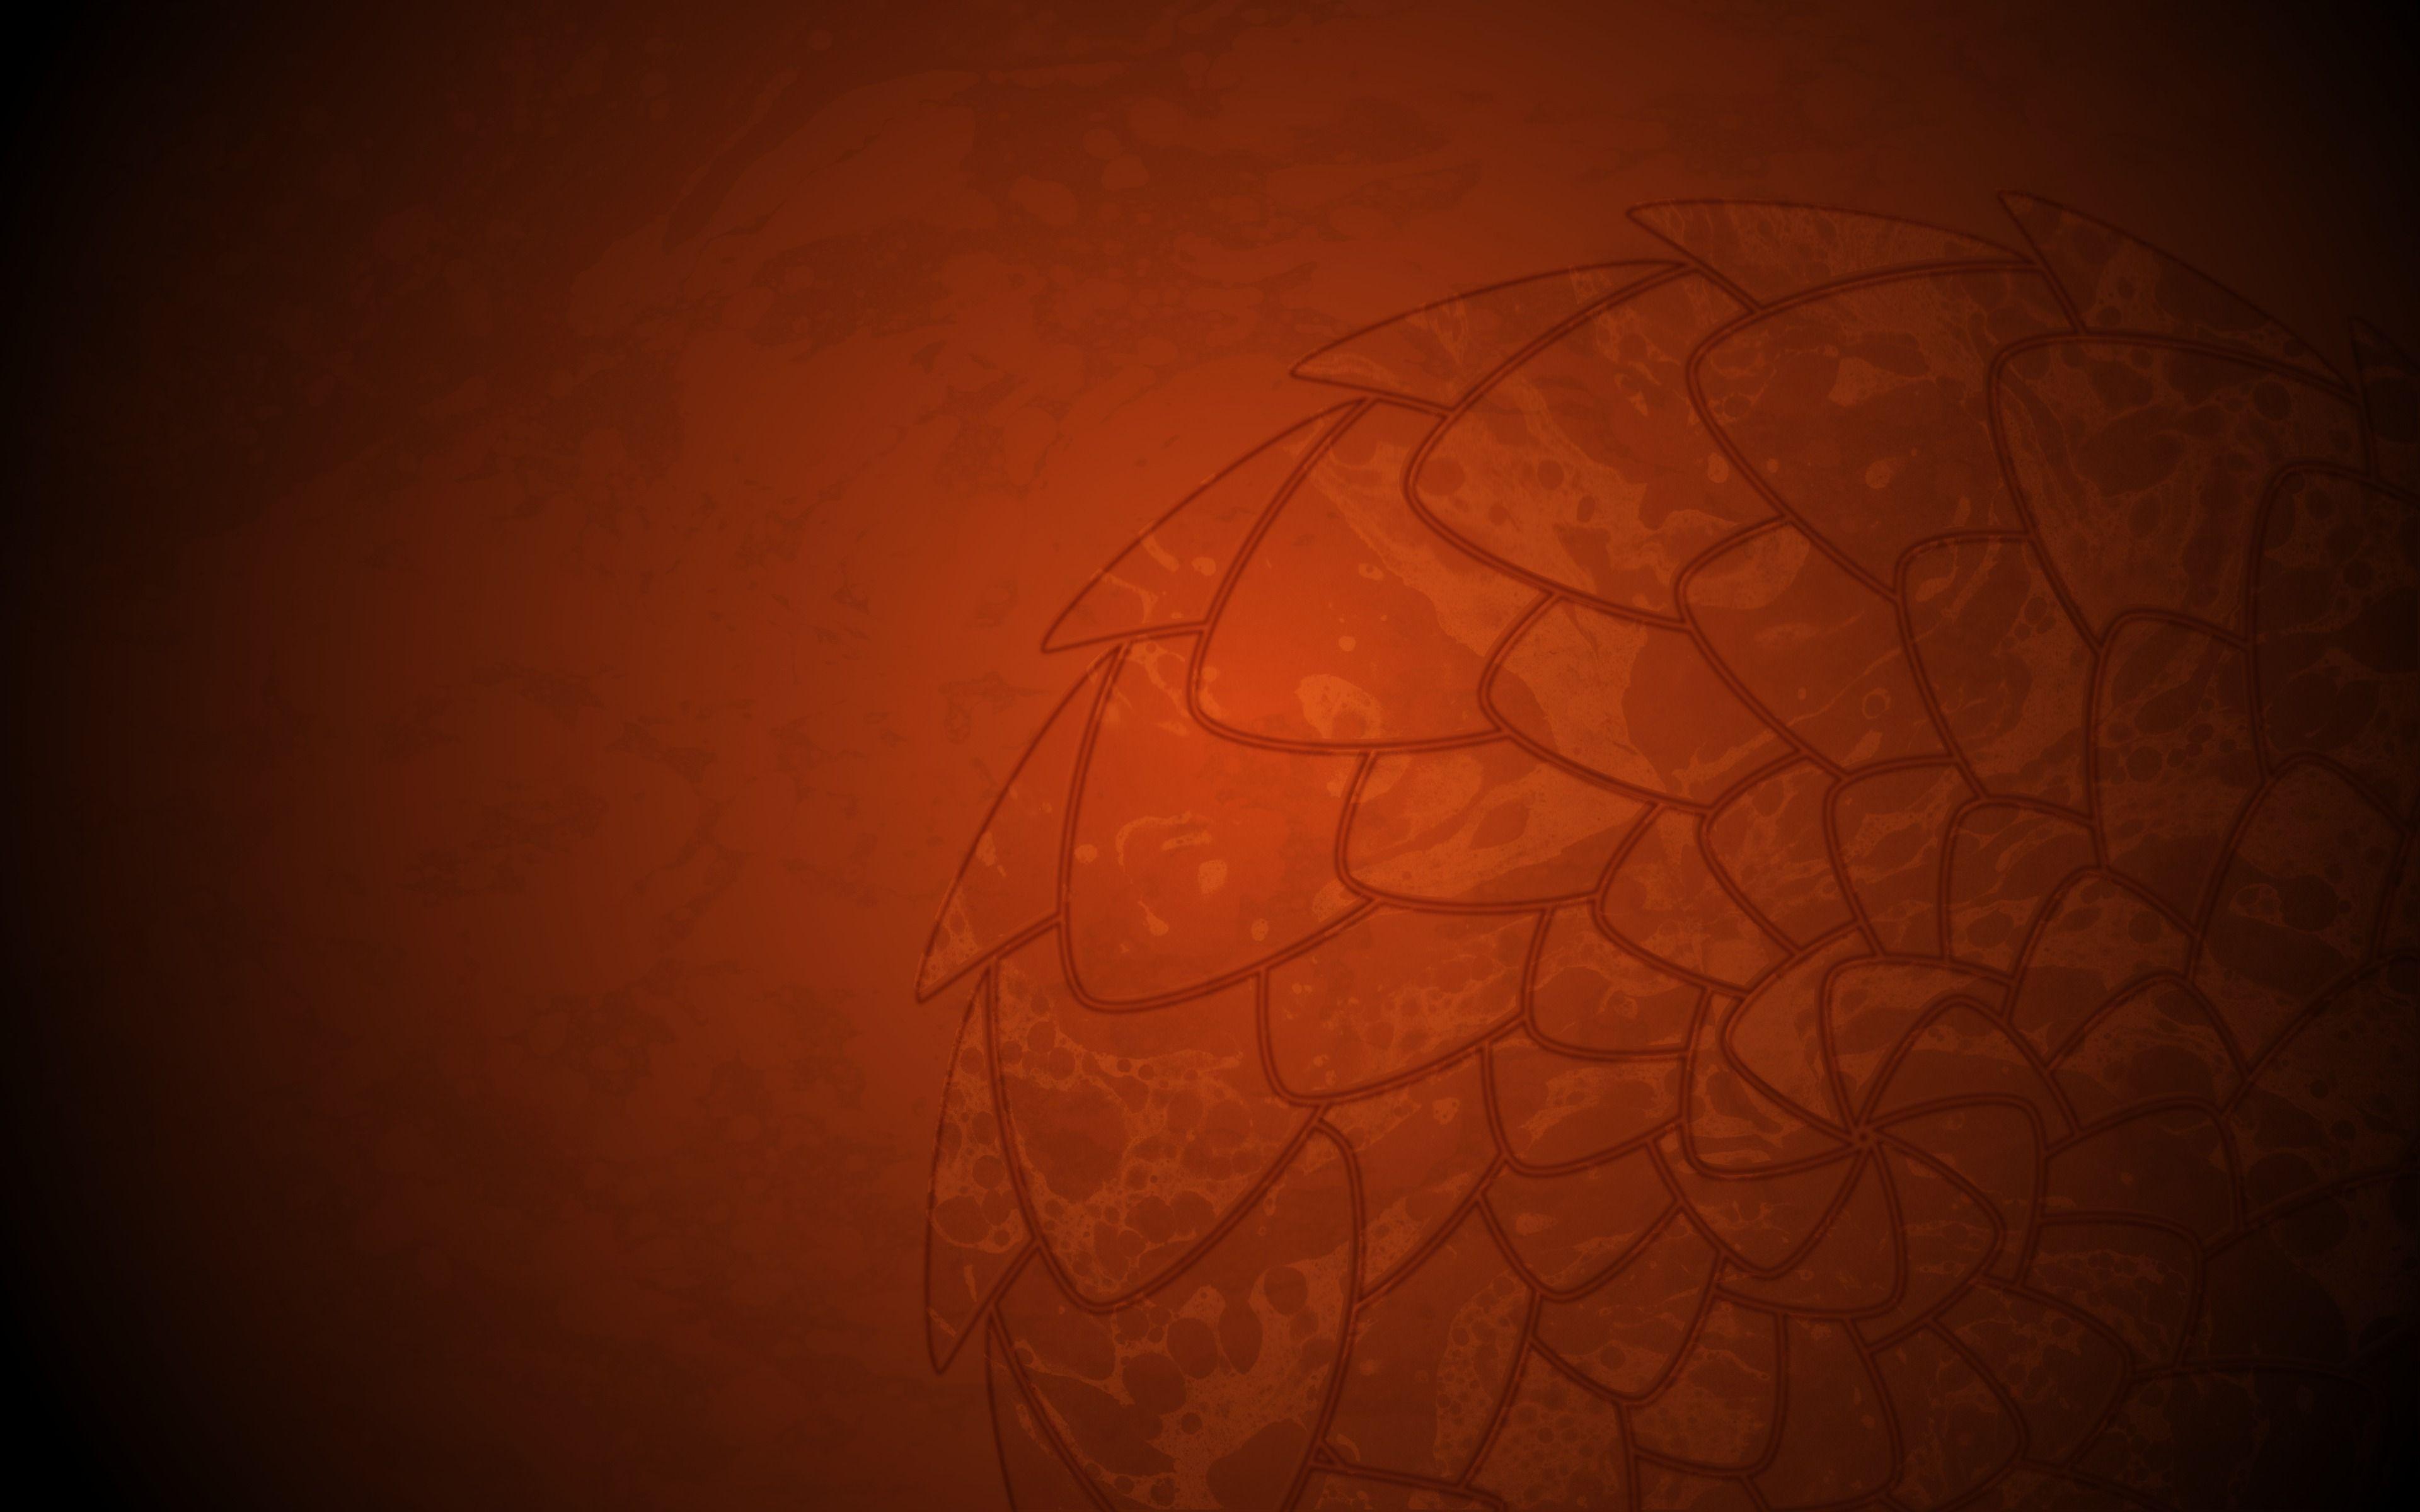 ubuntu precise pangolin wallpaper - photo #17